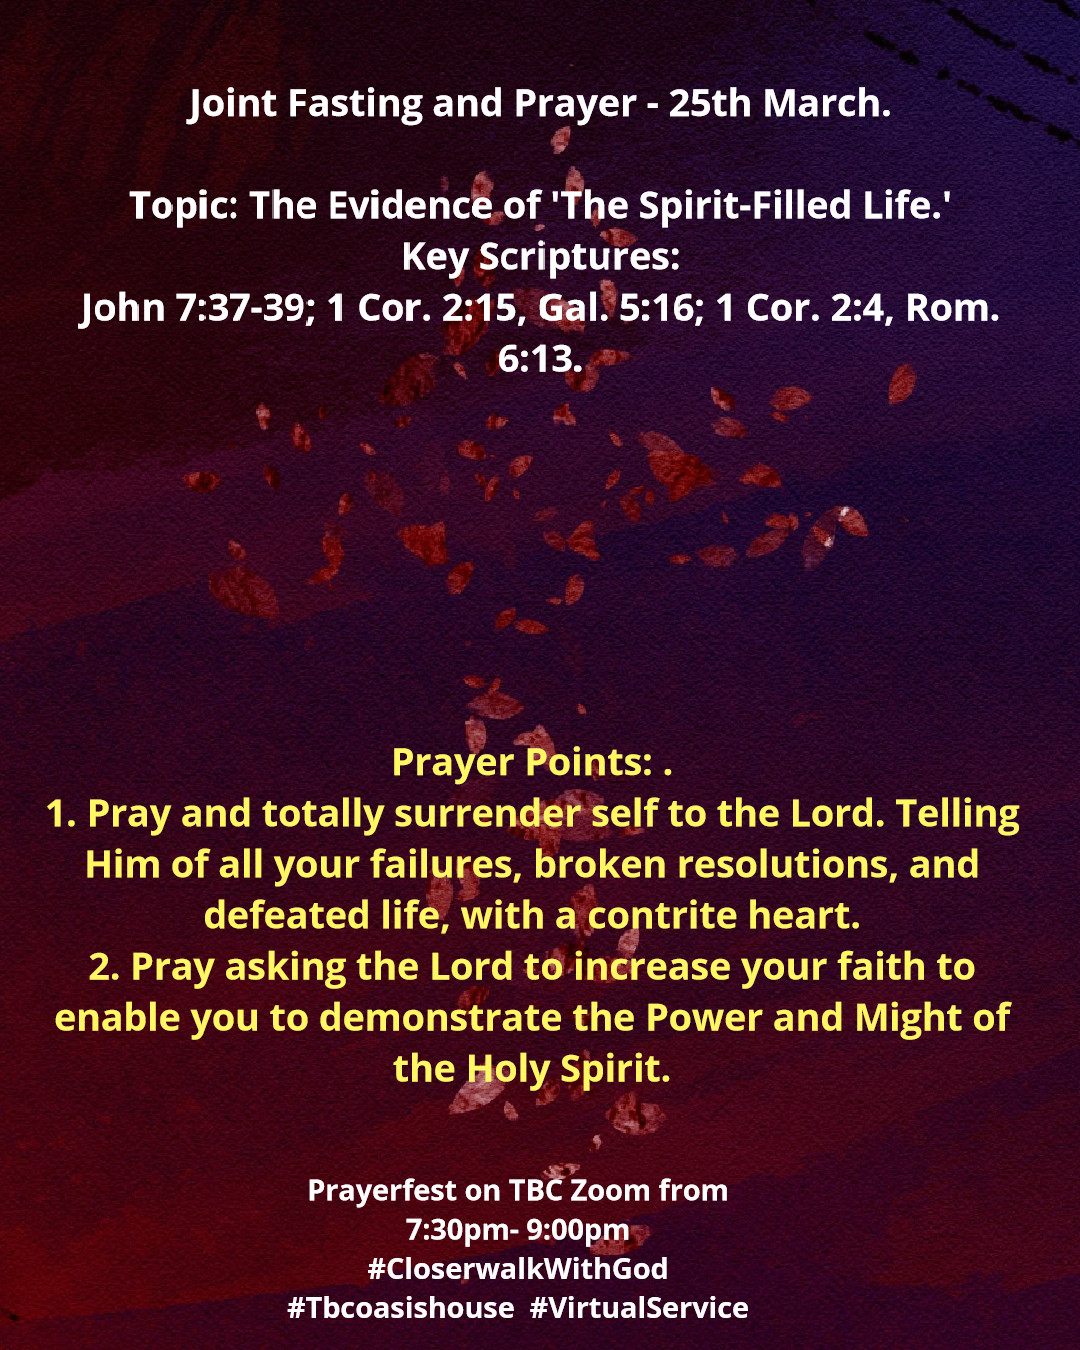 Joint Fasting and Prayer - Prayerfest Day 2